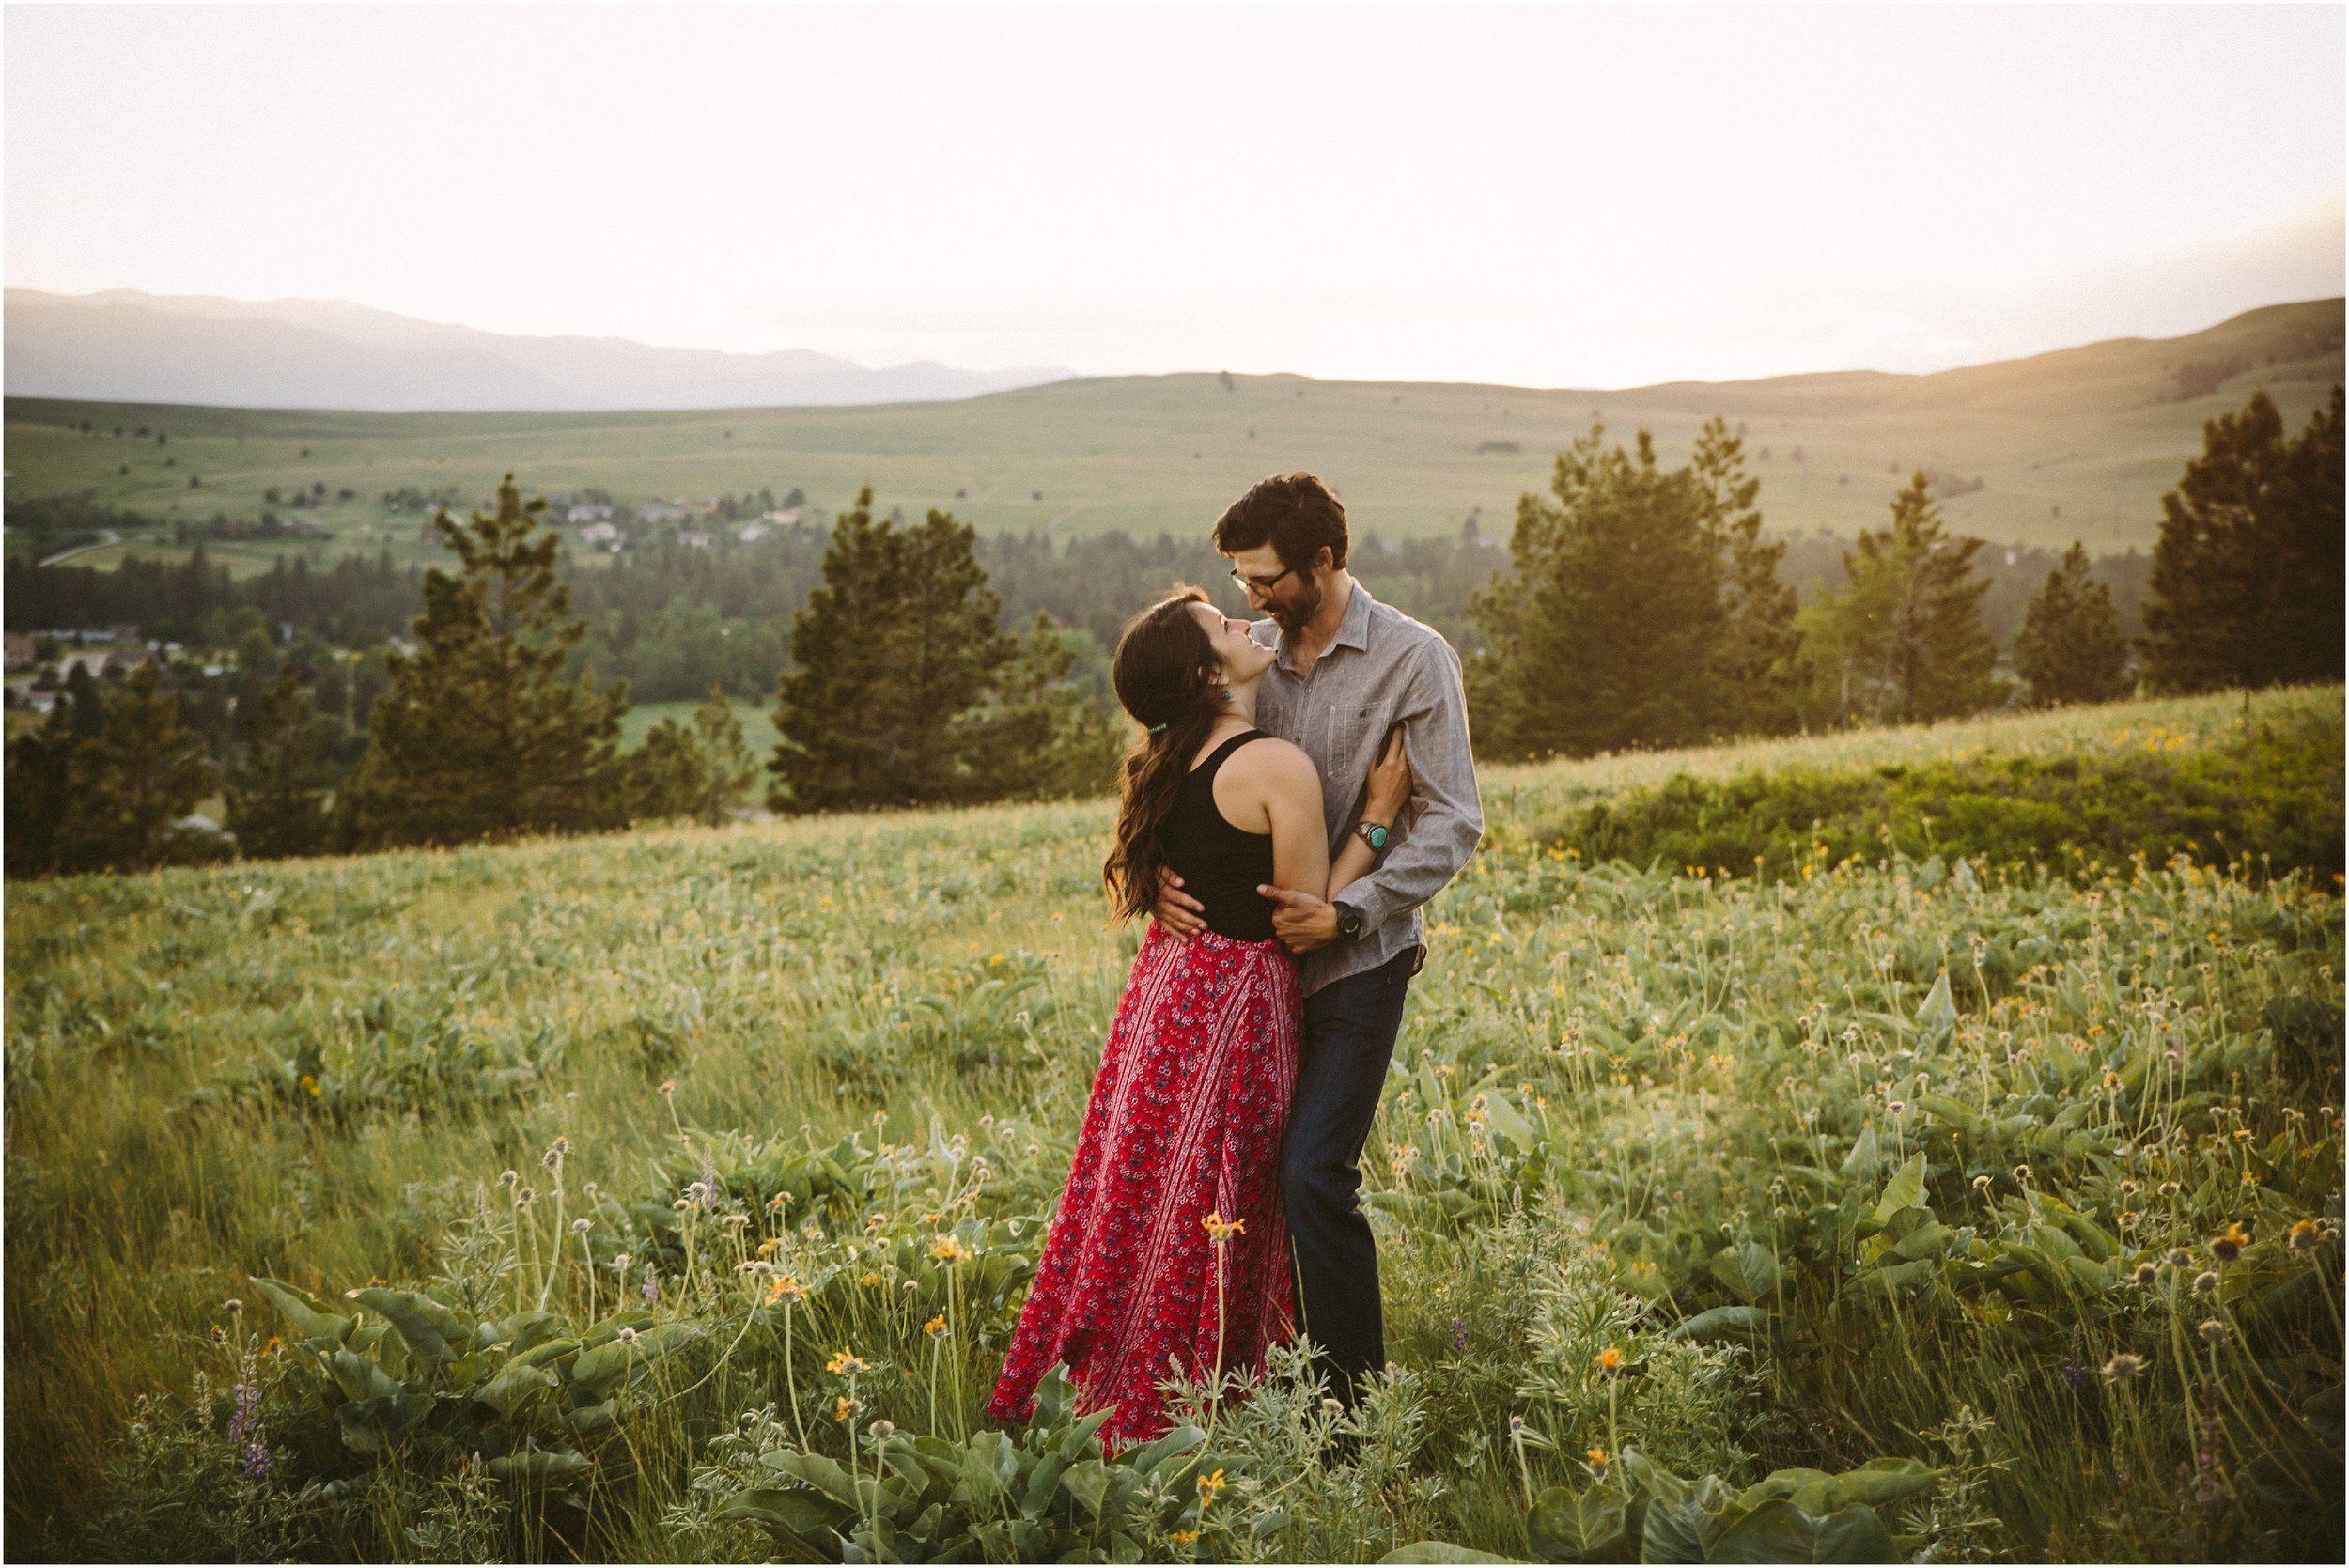 Nick & Madeleine || Missoula MT Engagement Photographer